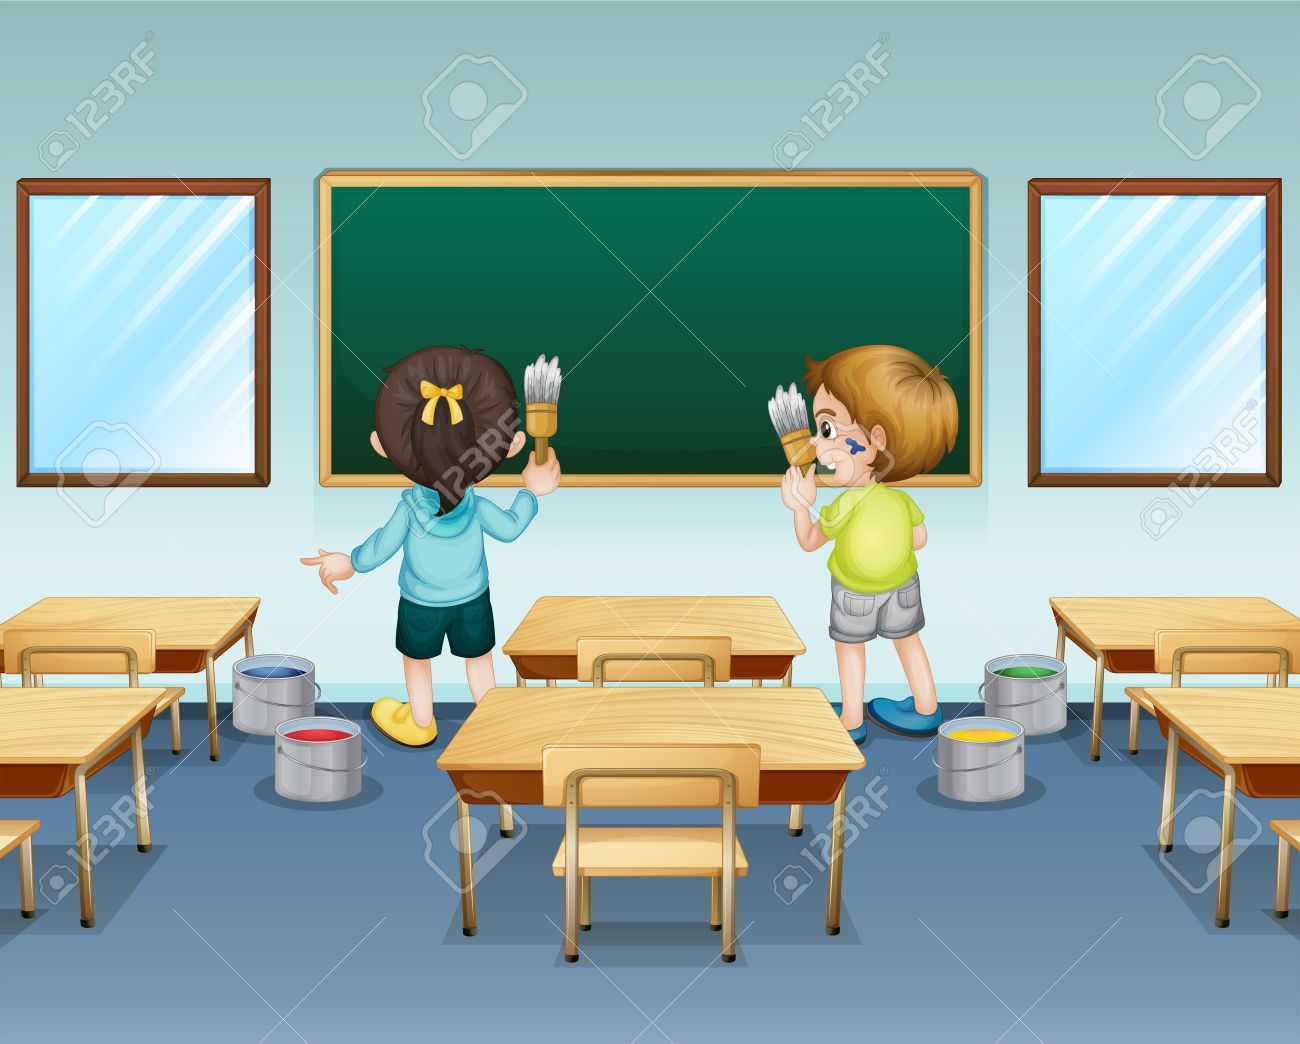 Empty cartoon classroom background - Classroom Students Floor Illustration Of Students Painting Their Classroom Illustration